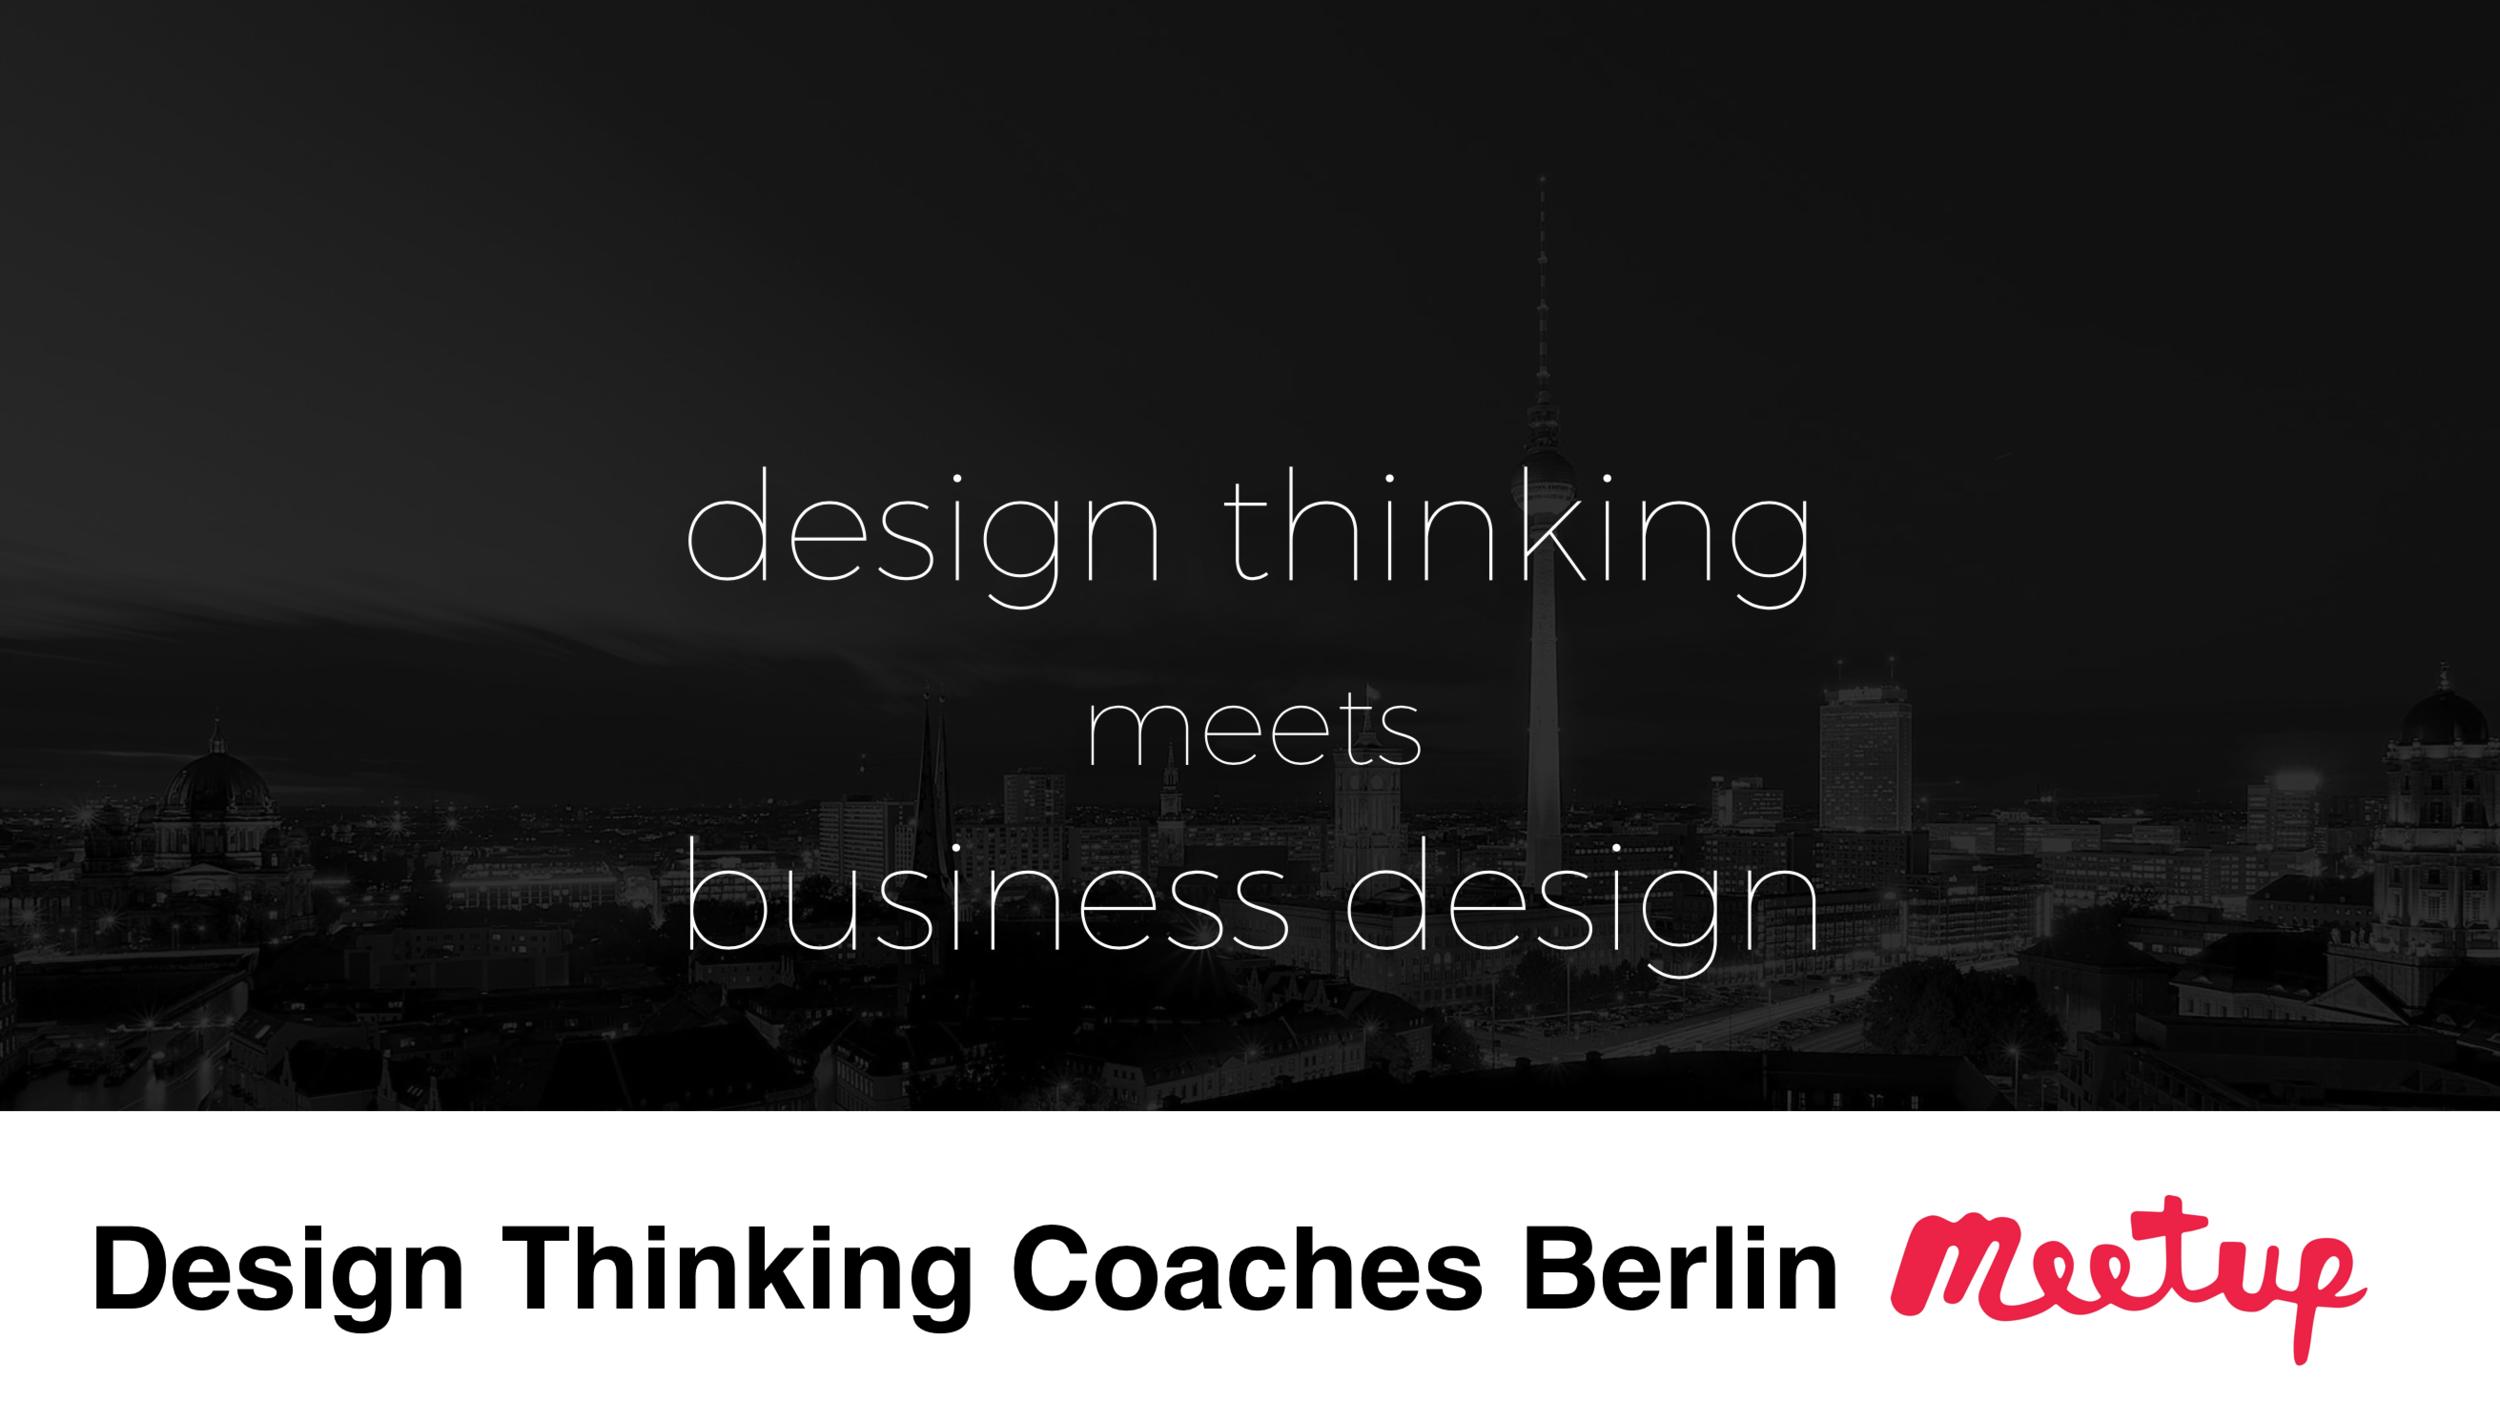 Design Thinking Coaches Berlin Meetup